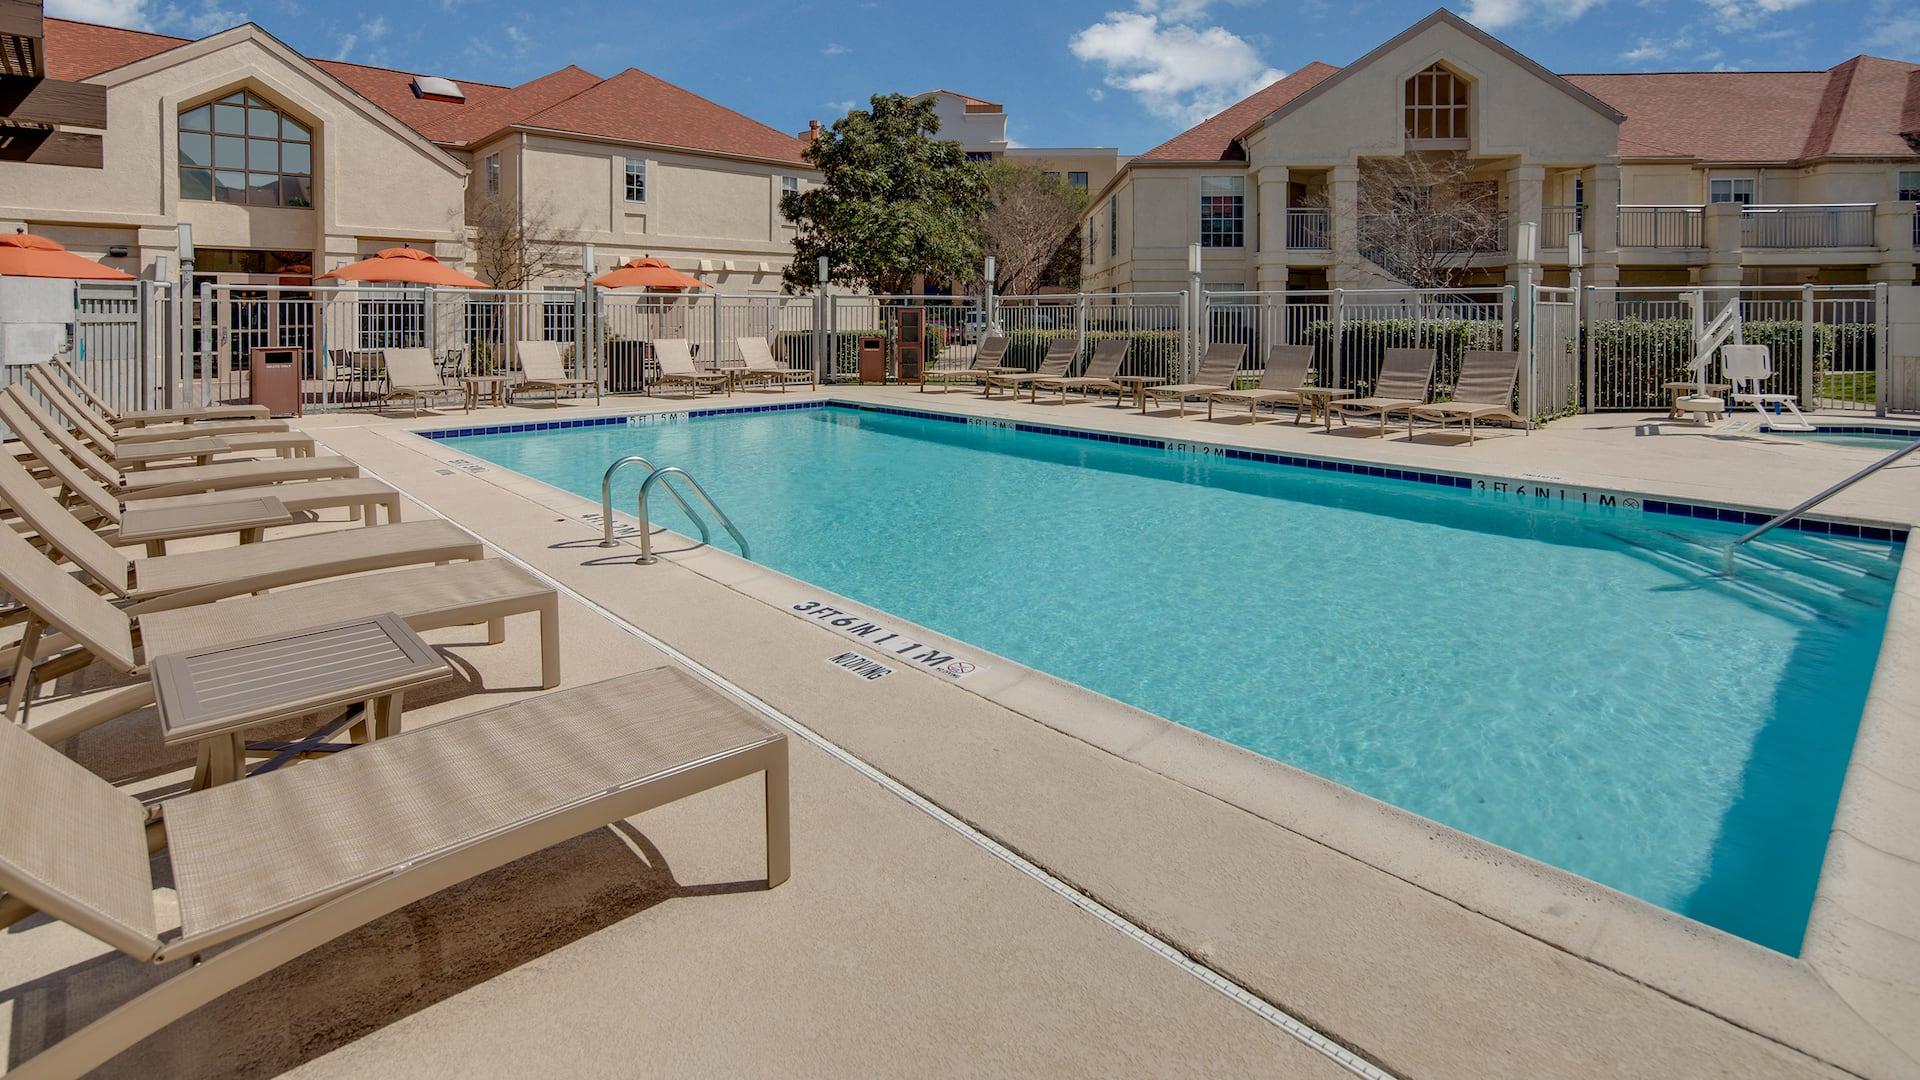 Hyatt House Dallas / Addison pool